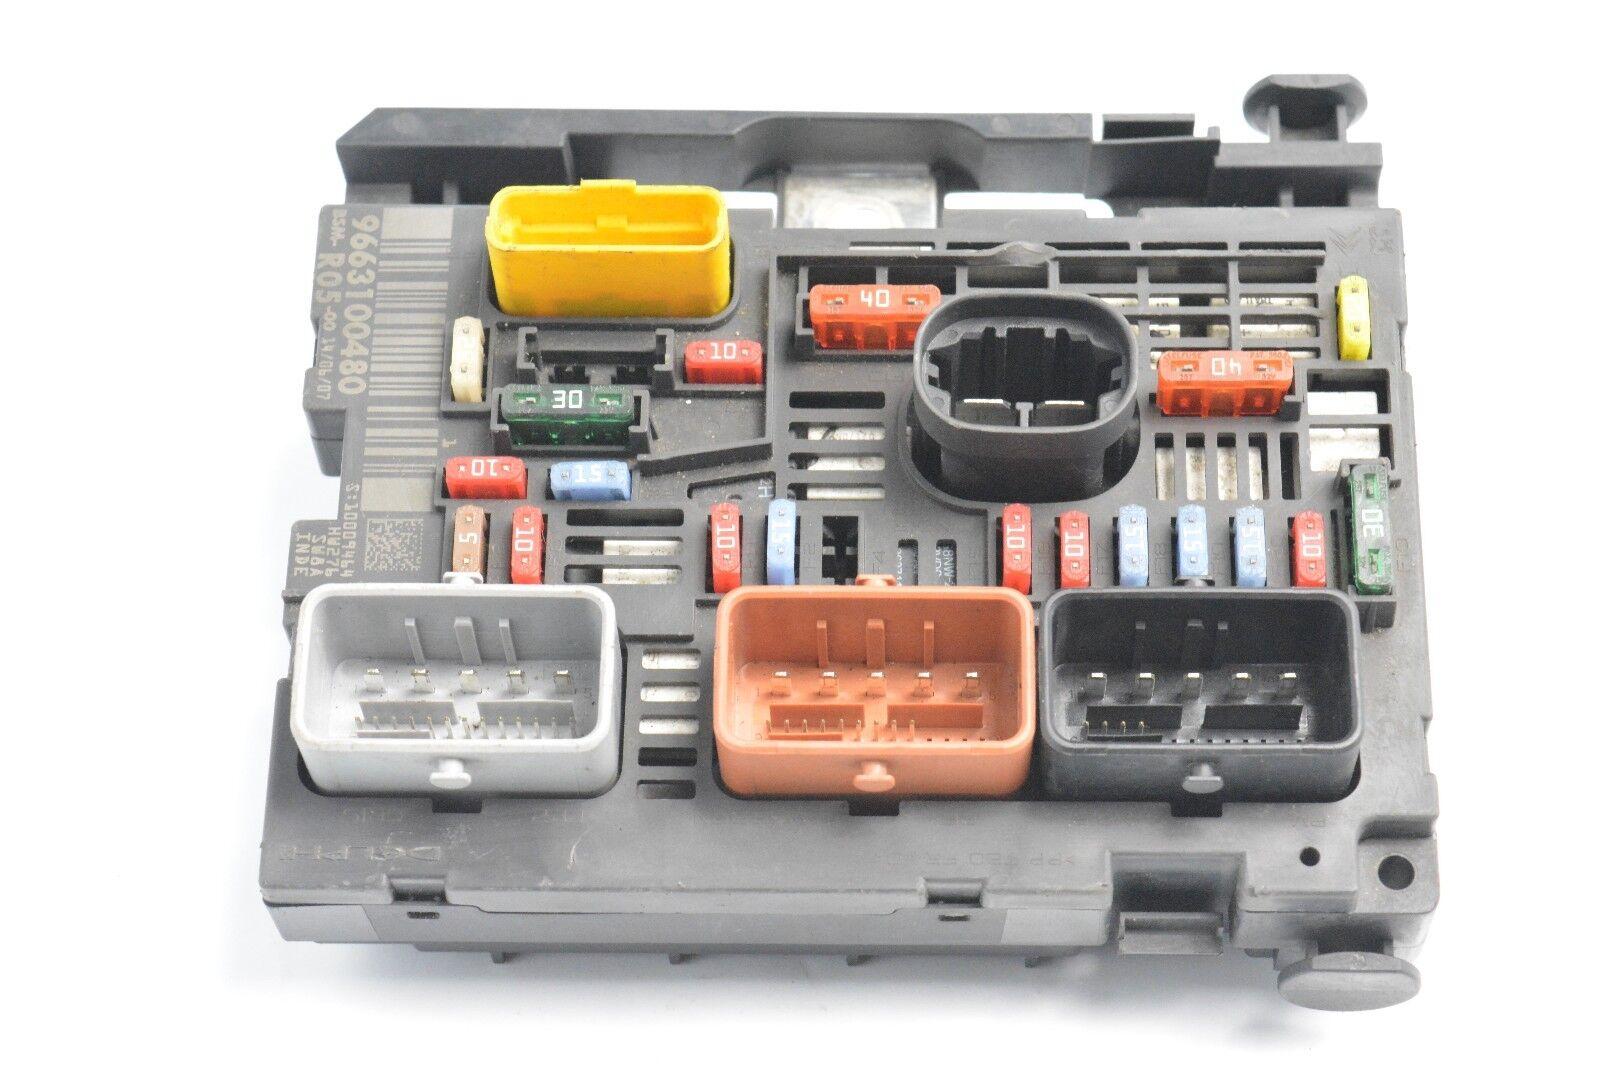 Peugeot 308 I 07 11 Control Unit Ecu Module Bsm R05 9663100480 75tkm Fuse Box Cover Norton Secured Powered By Verisign